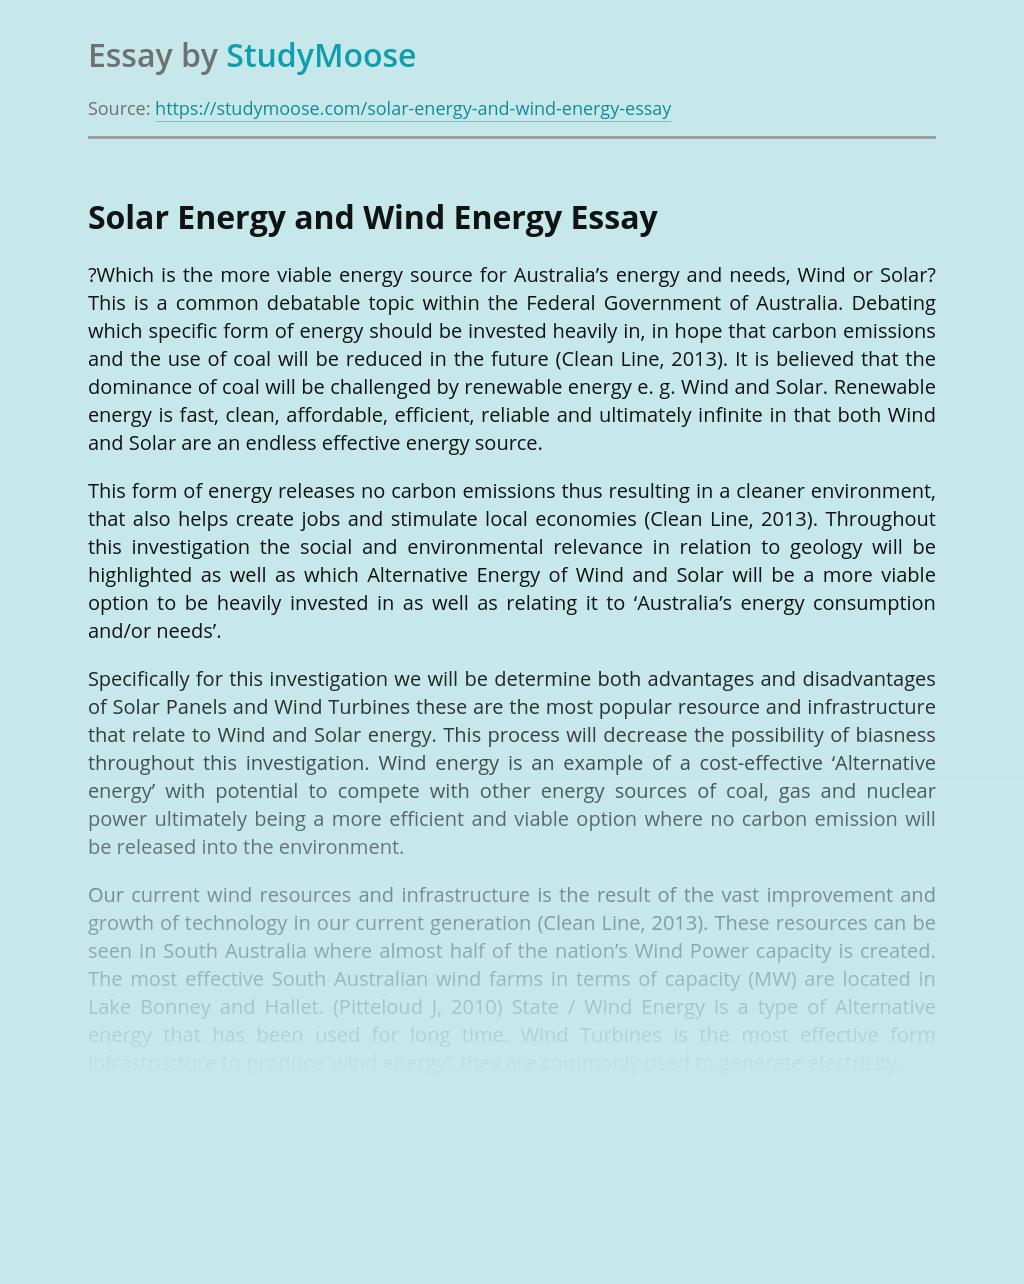 Solar Energy and Wind Energy